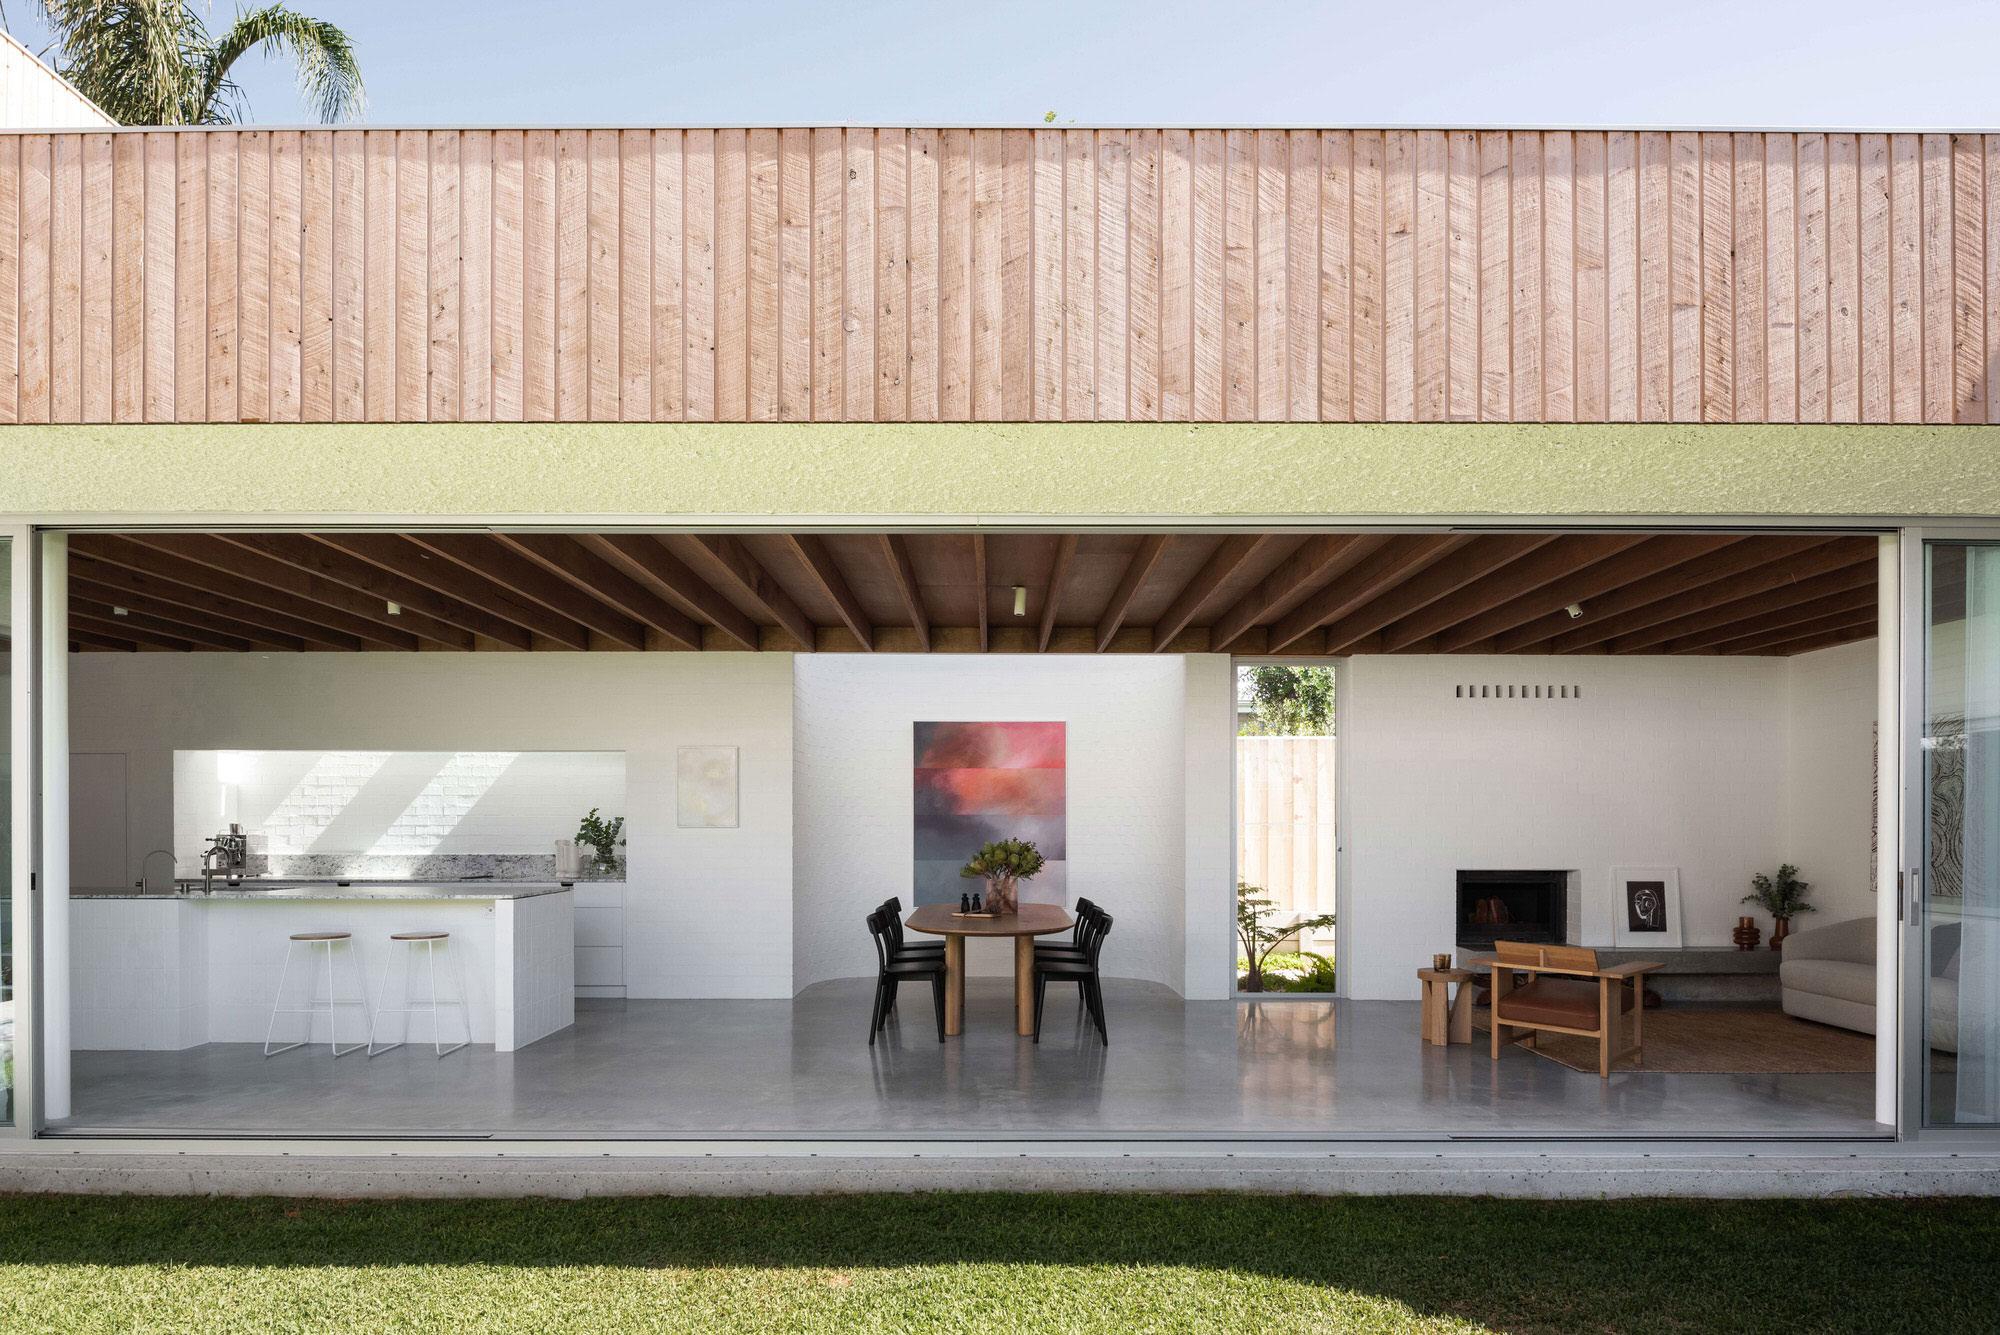 Nic Brunsdon East Fremantle House Australian Architecture Photo Dion Robeson Yellowtrace 05